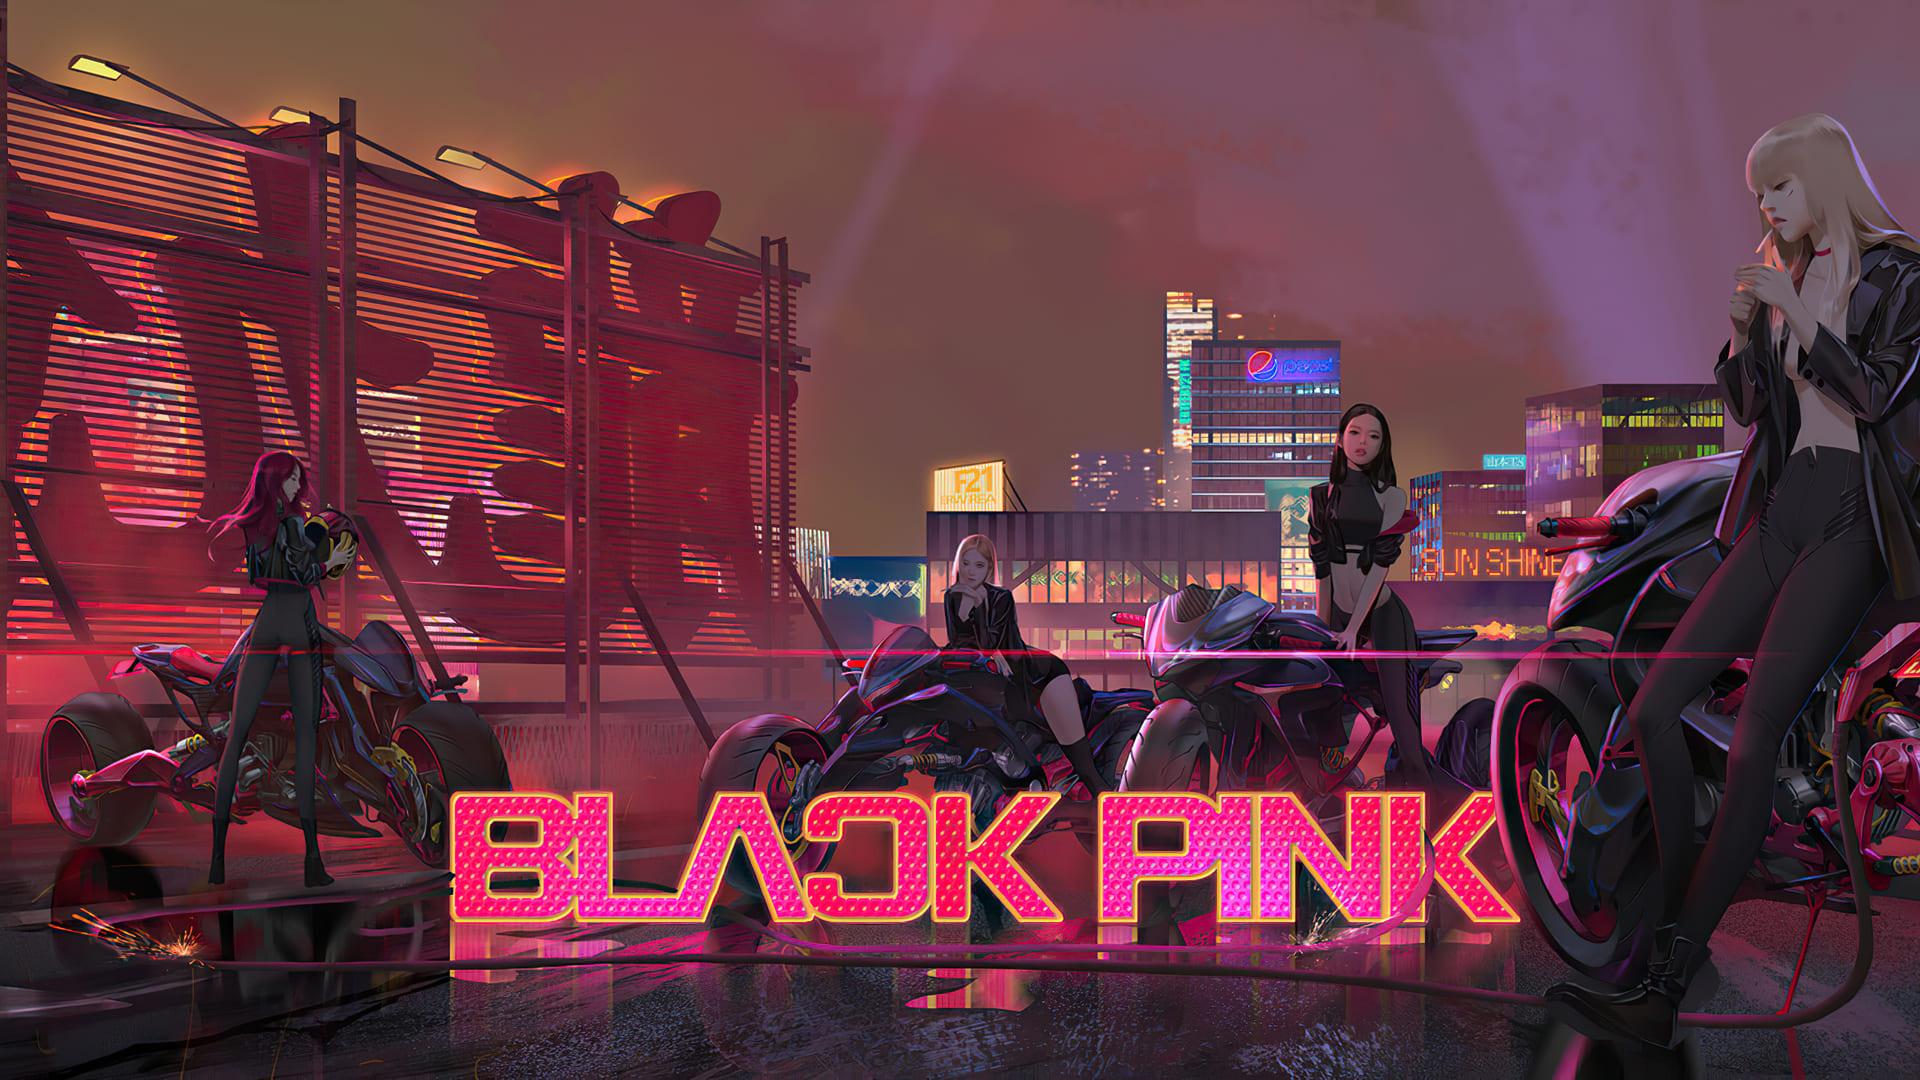 Blackpink Desktop Wallpaper Hd 2020 / Find the best ...